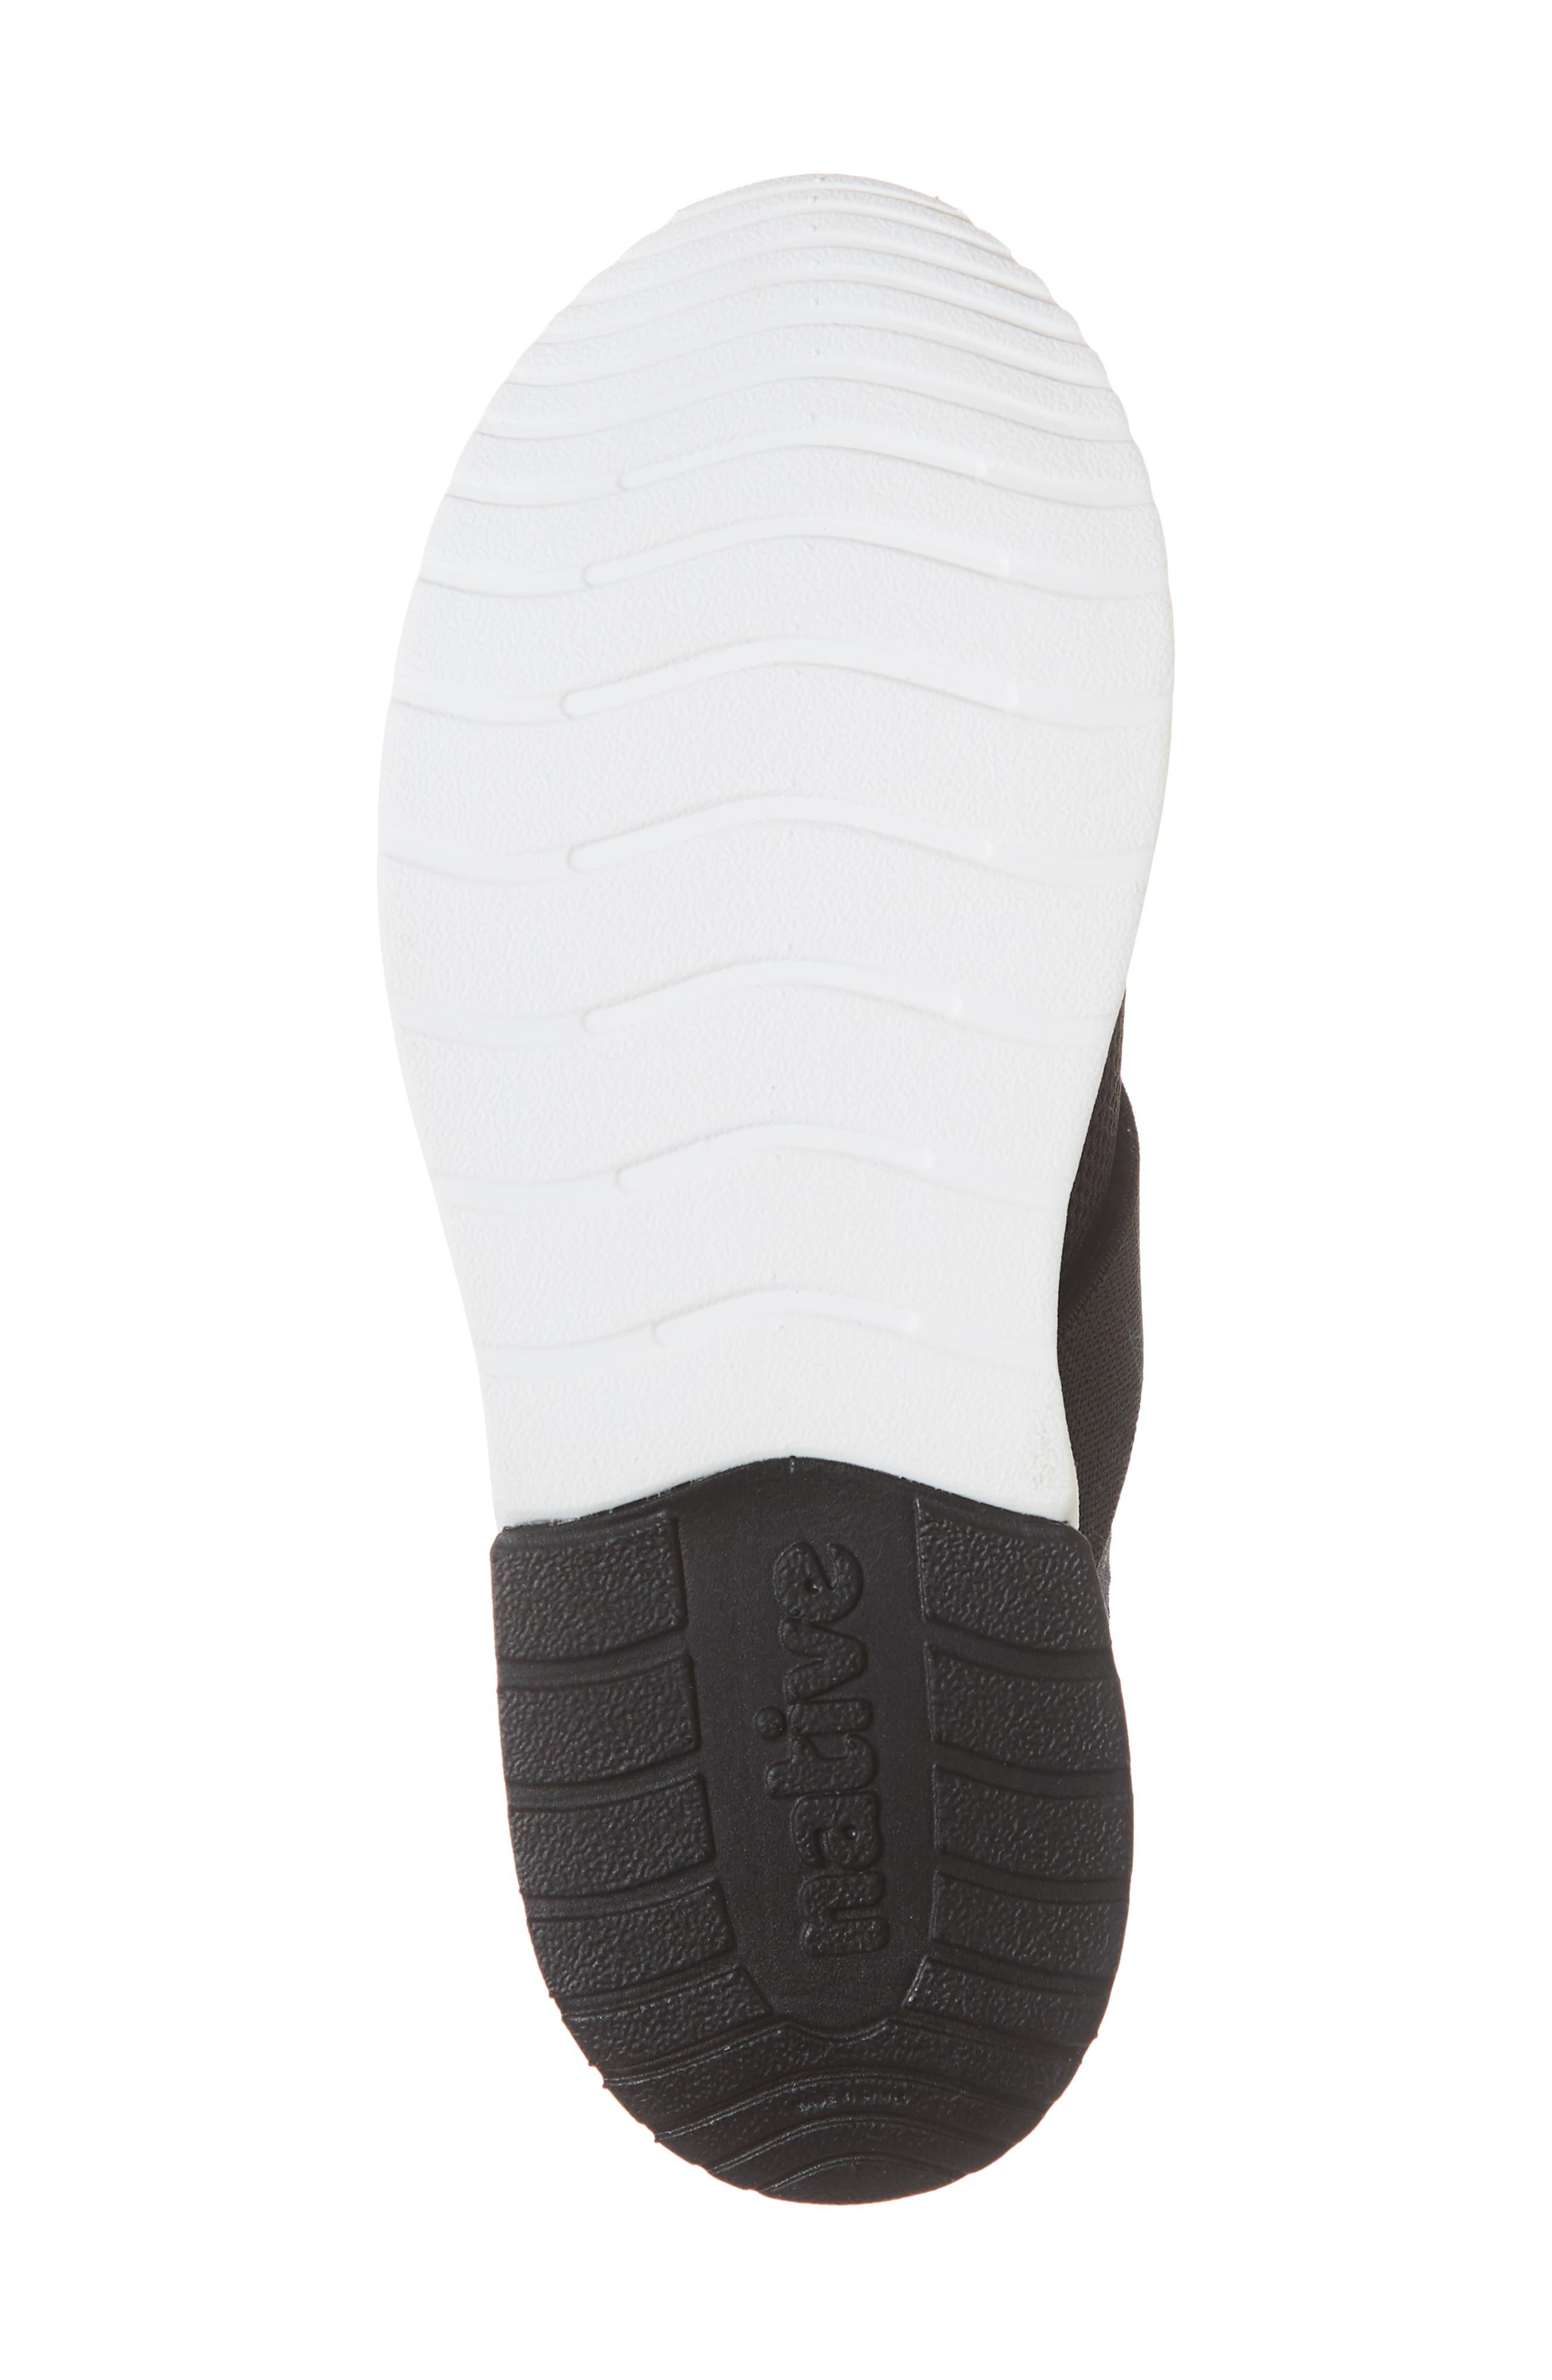 Phoenix Slip-On Sneaker,                             Alternate thumbnail 6, color,                             JIFFY BLACK/ SHELL WHITE